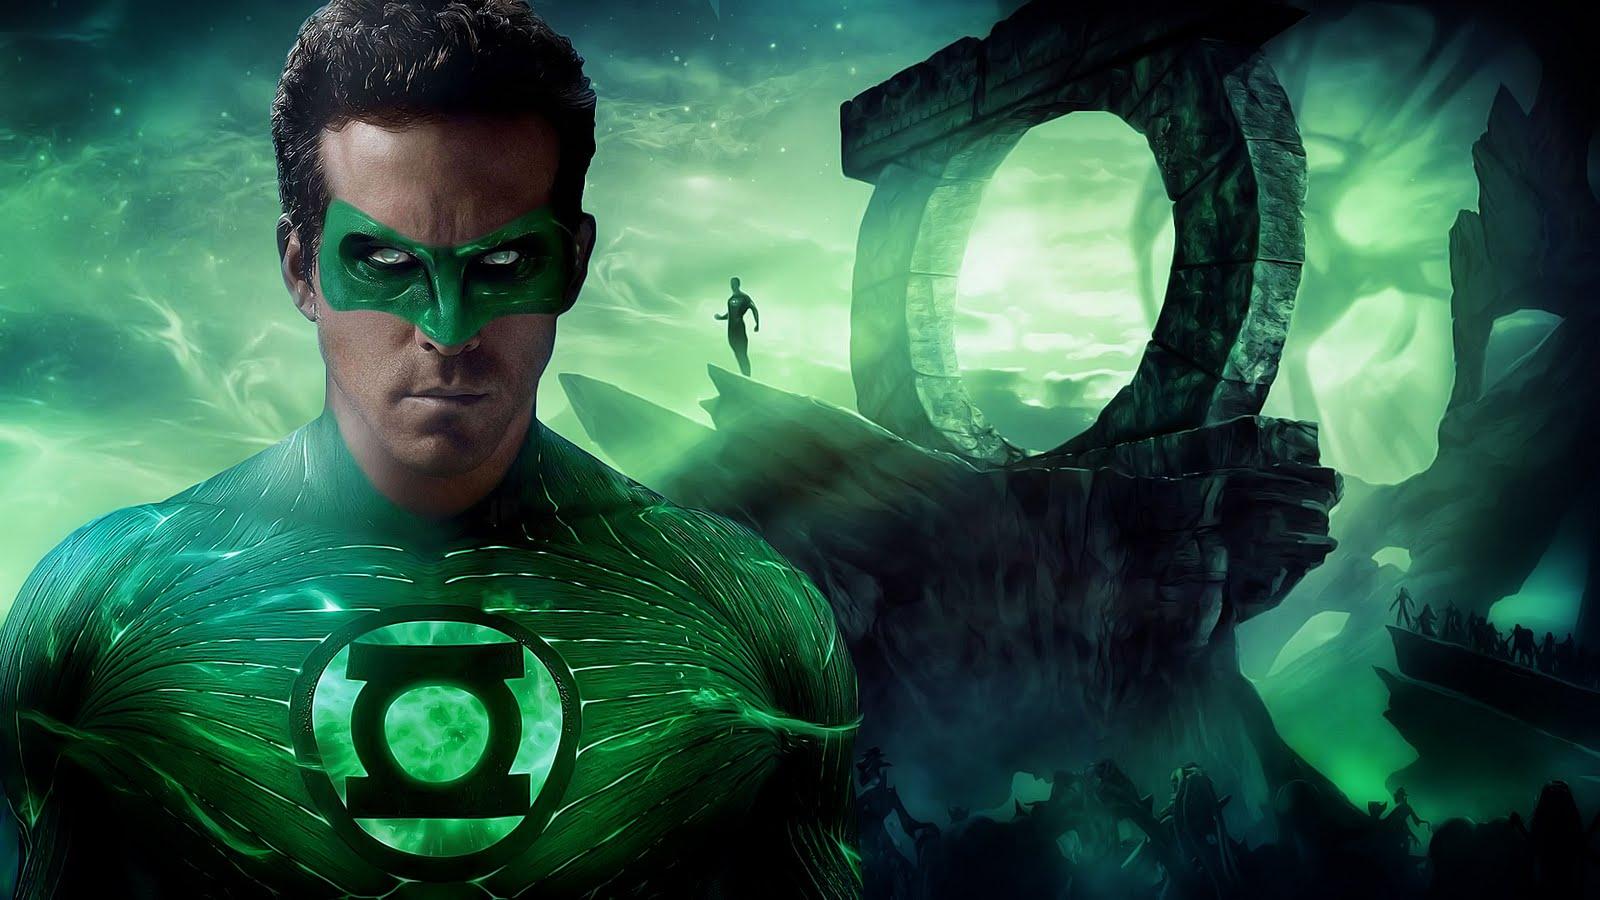 Green Lantern, Marvel, Ryan Reynolds, Super Hero Movie Wallpaper